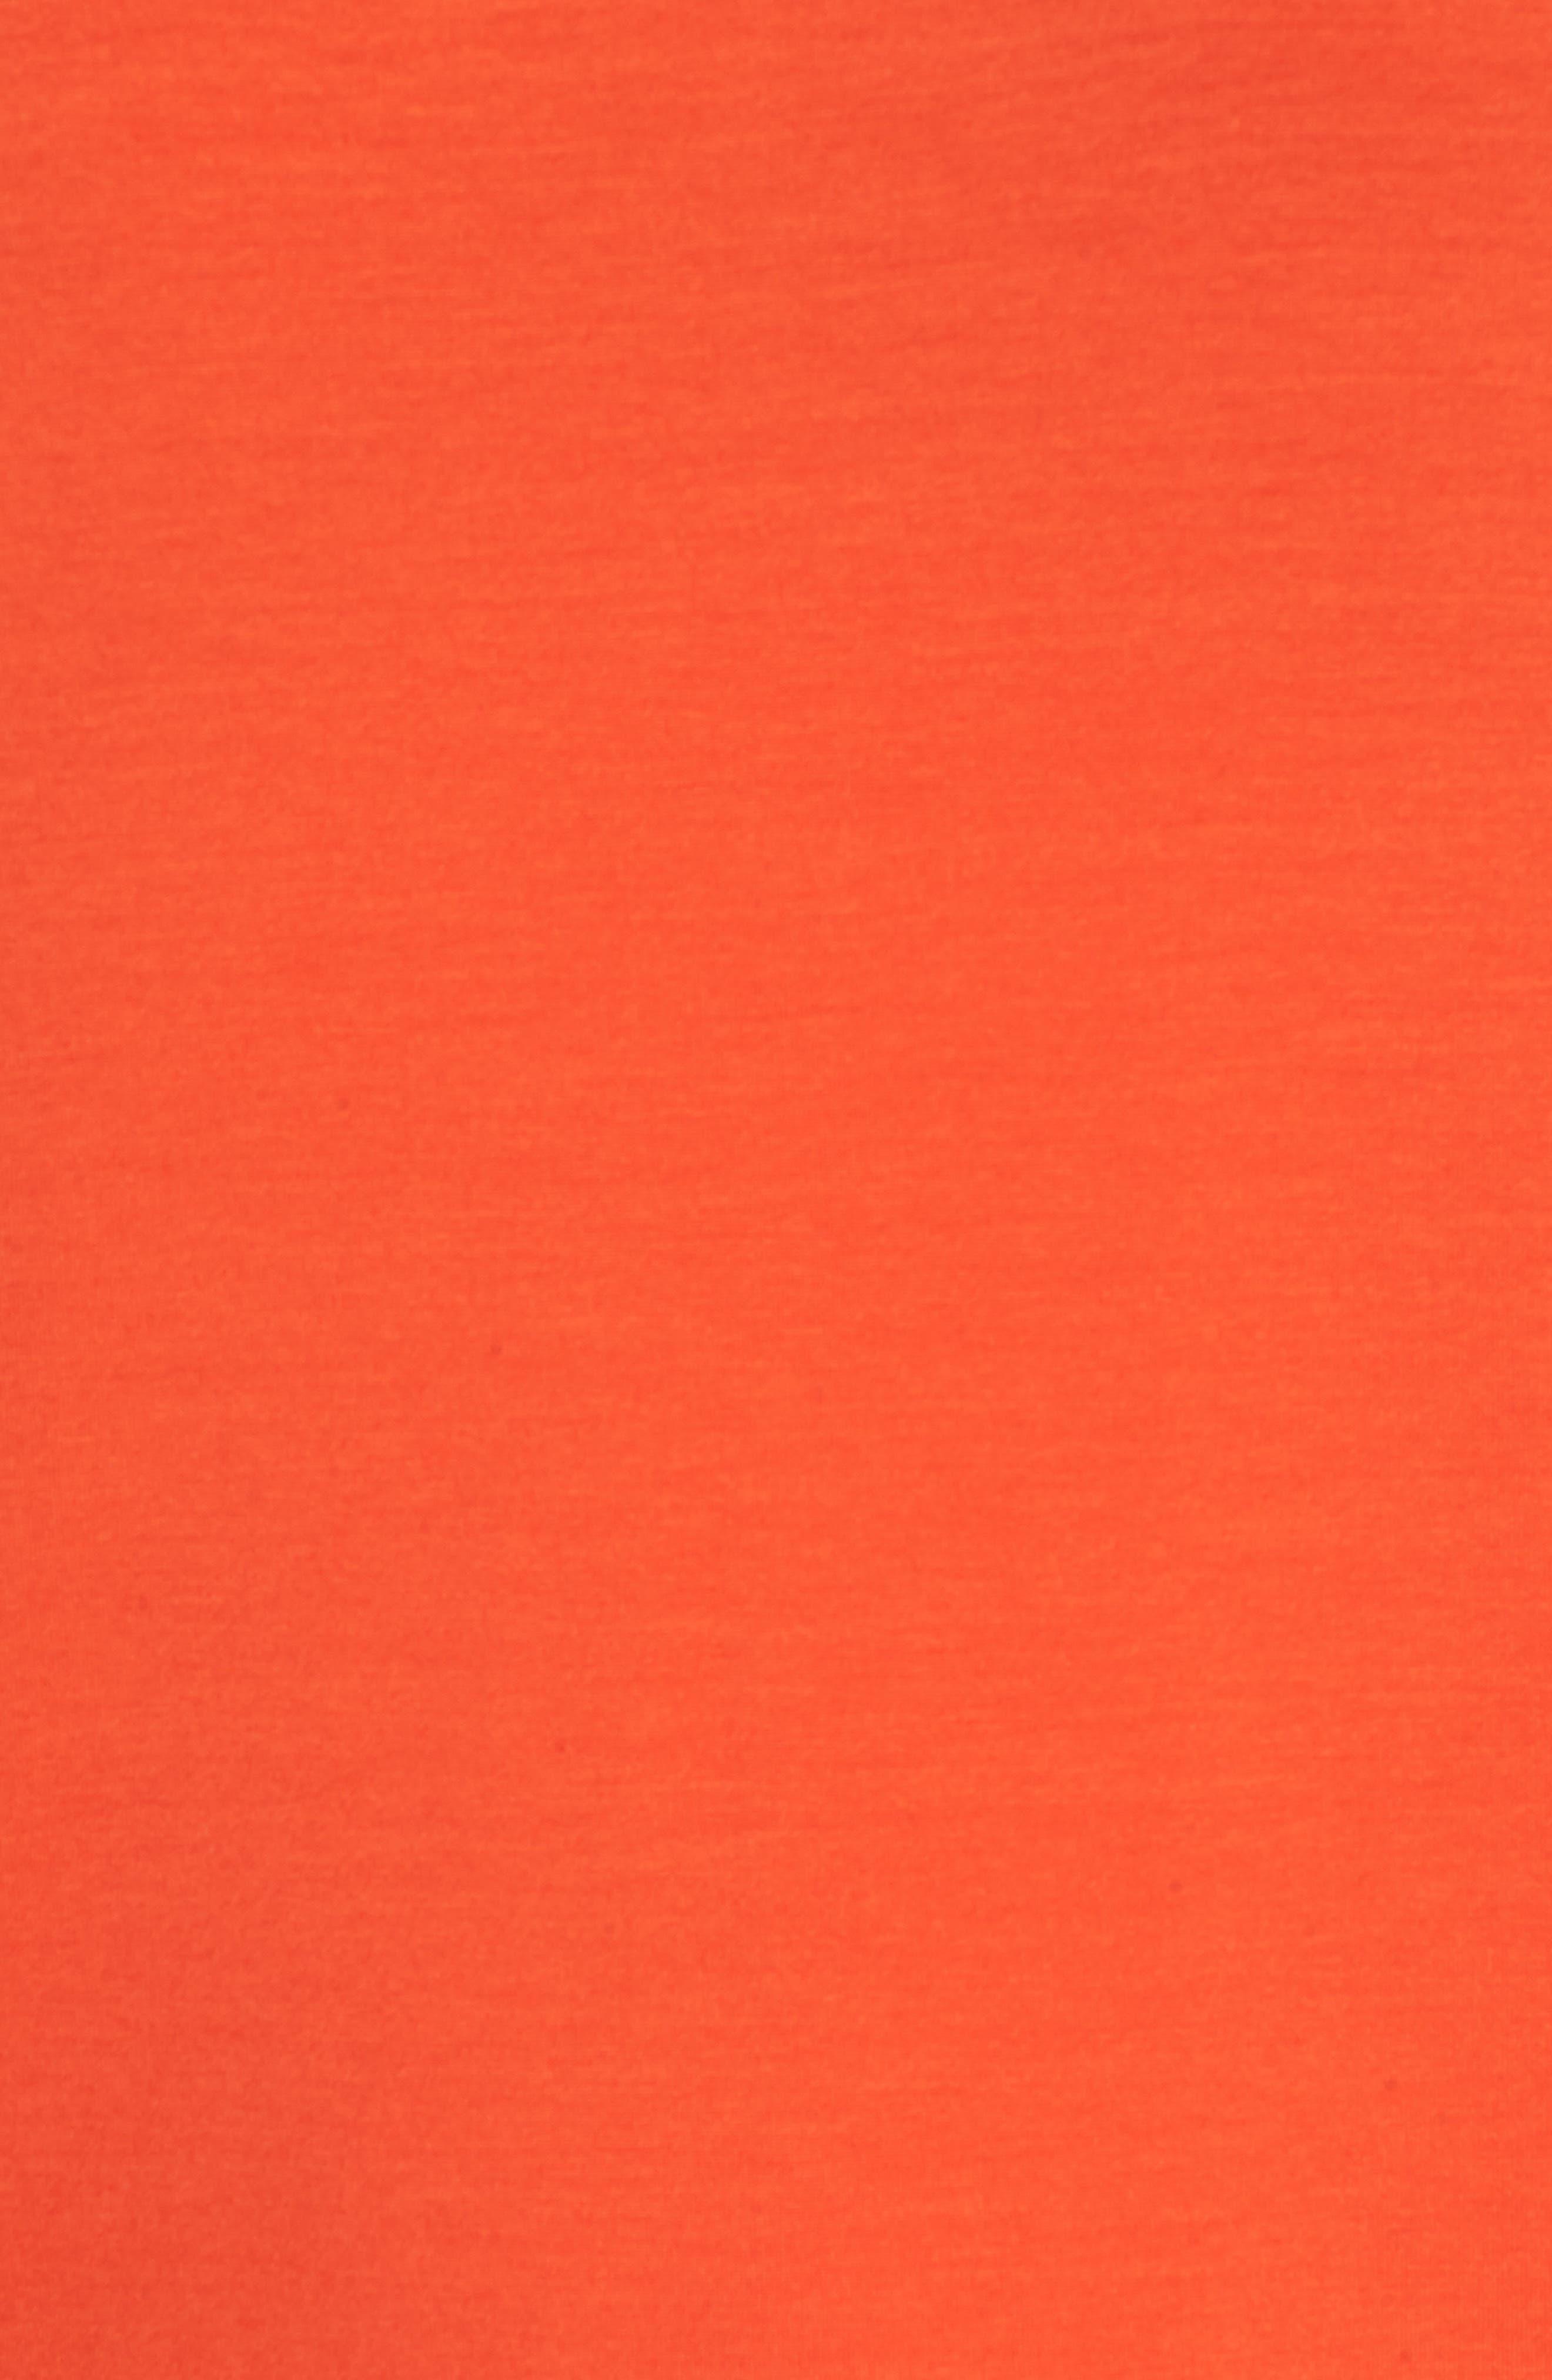 V-Back Stretch Tencel<sup>®</sup> Lyocell Shift Dress,                             Alternate thumbnail 11, color,